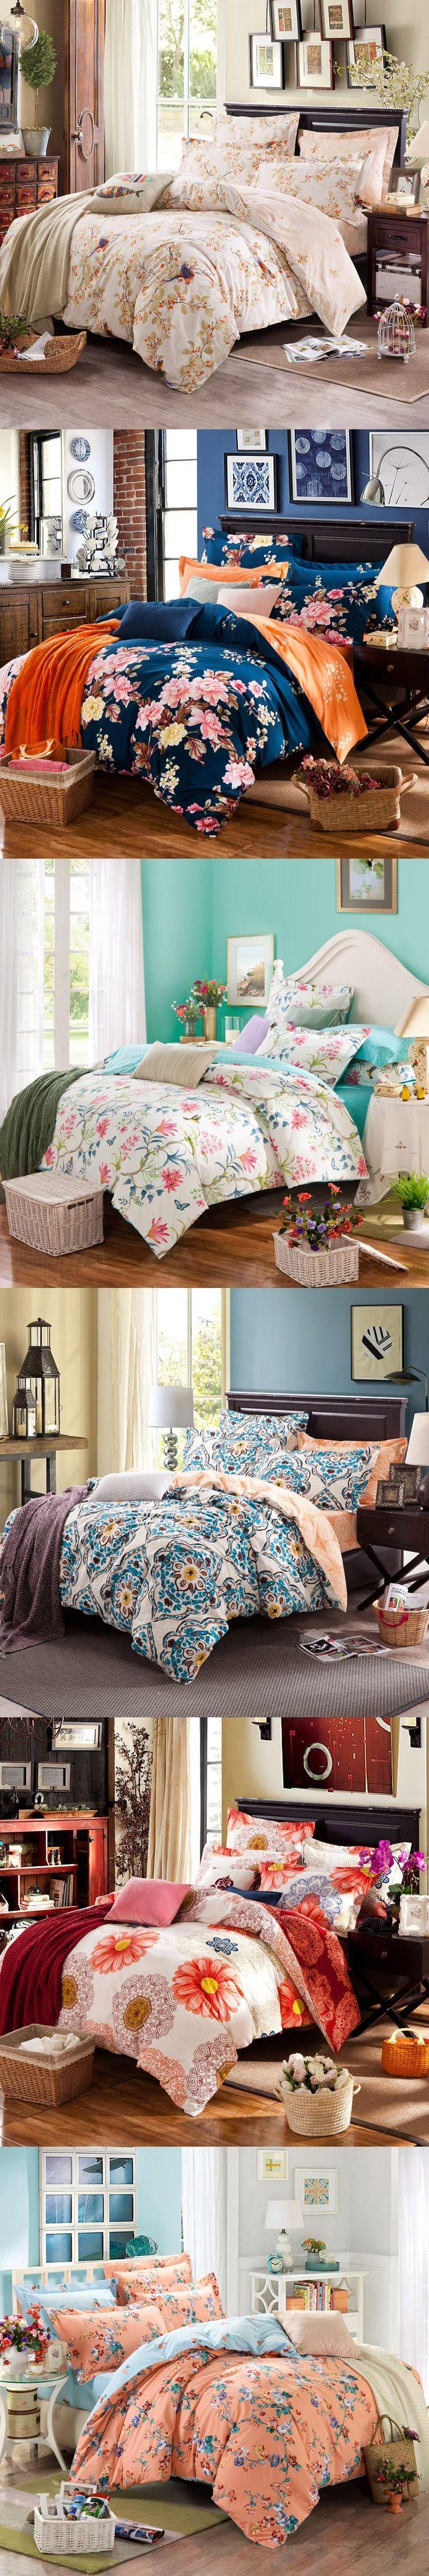 20 Colors 100% cotton Super Soft Twin Full Queen King size Bedding set Flowers Plaid Bed sheet set Duvet cover set Pillow shams